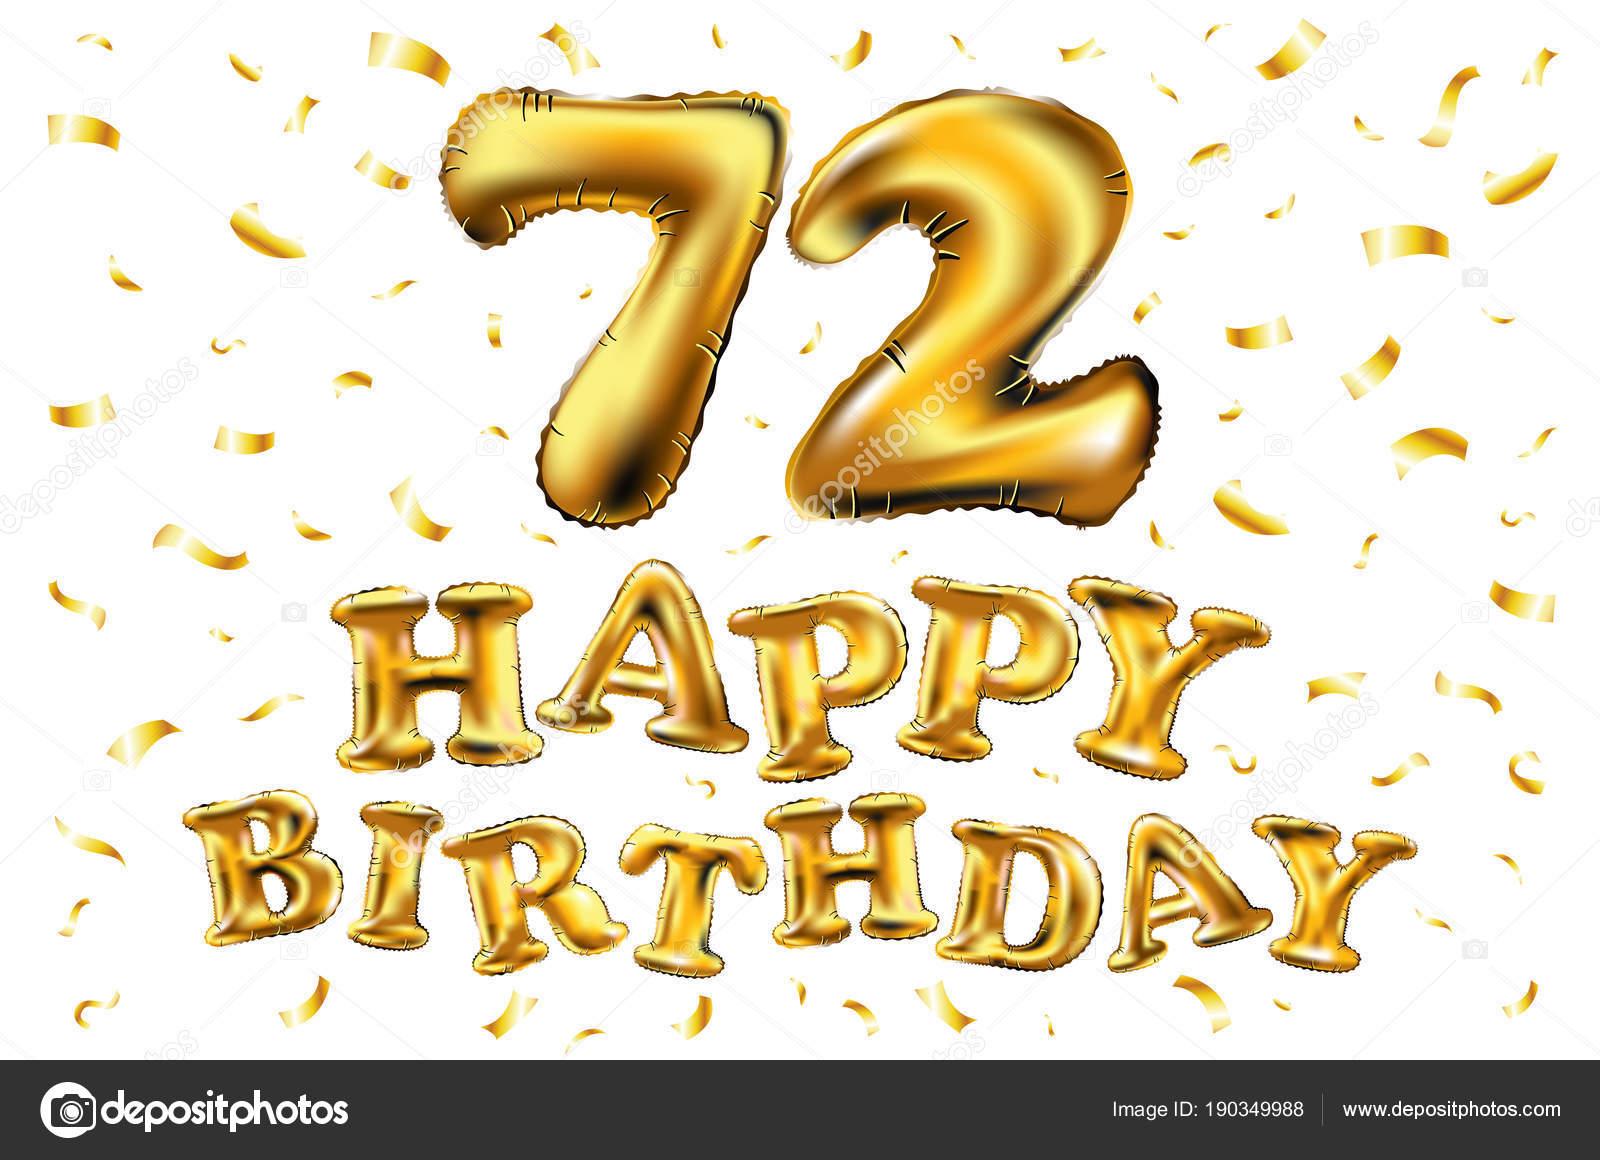 72 years anniversary, happy birthday joy celebration. 3d Illustration with  brilliant gold balloons &